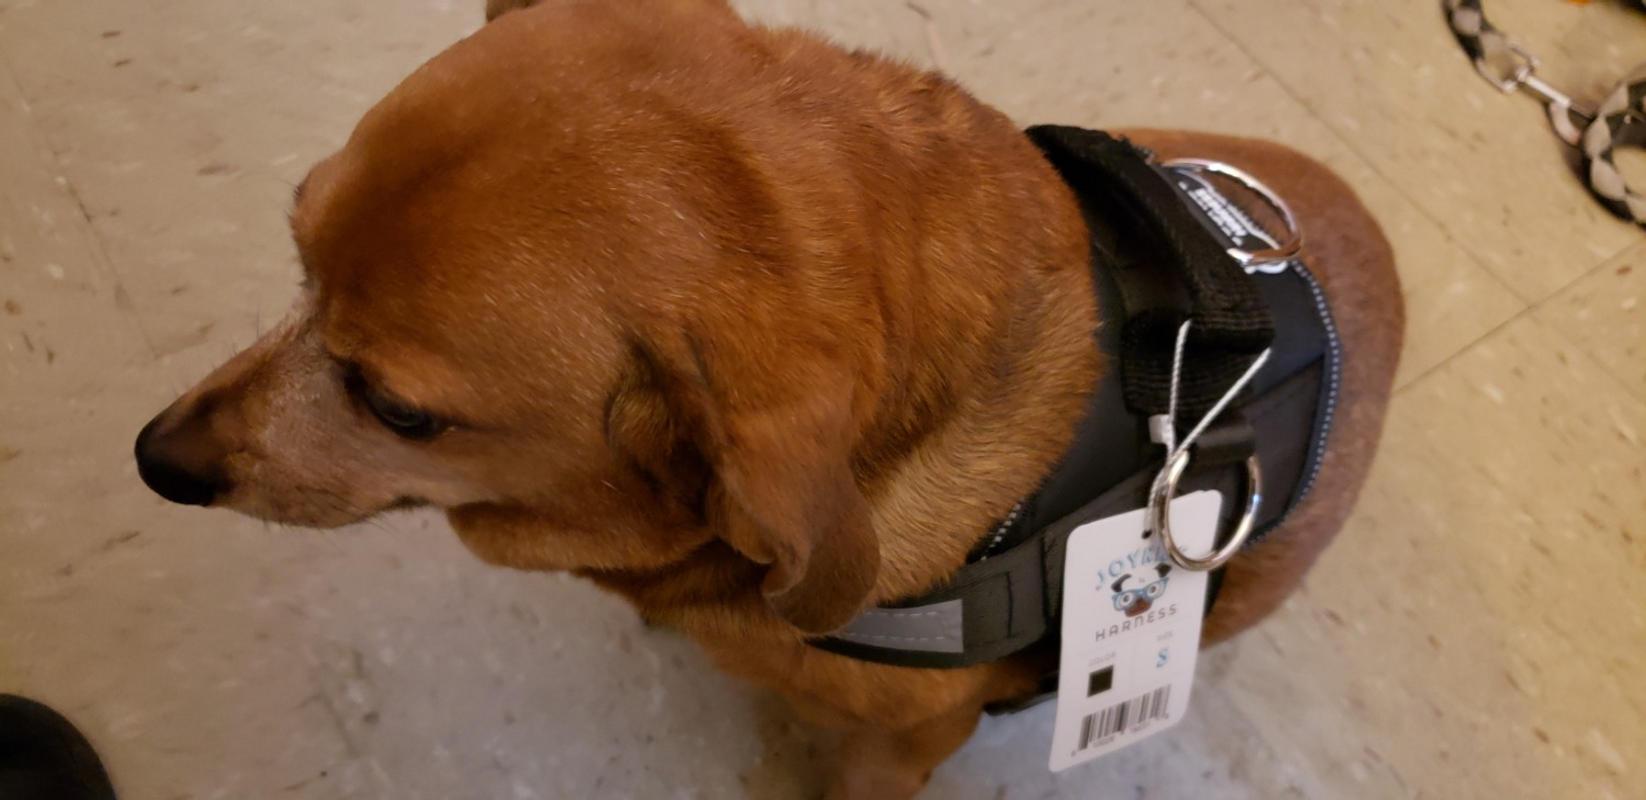 Heavy Duty Dog Leash  U2013 Joyride Harness